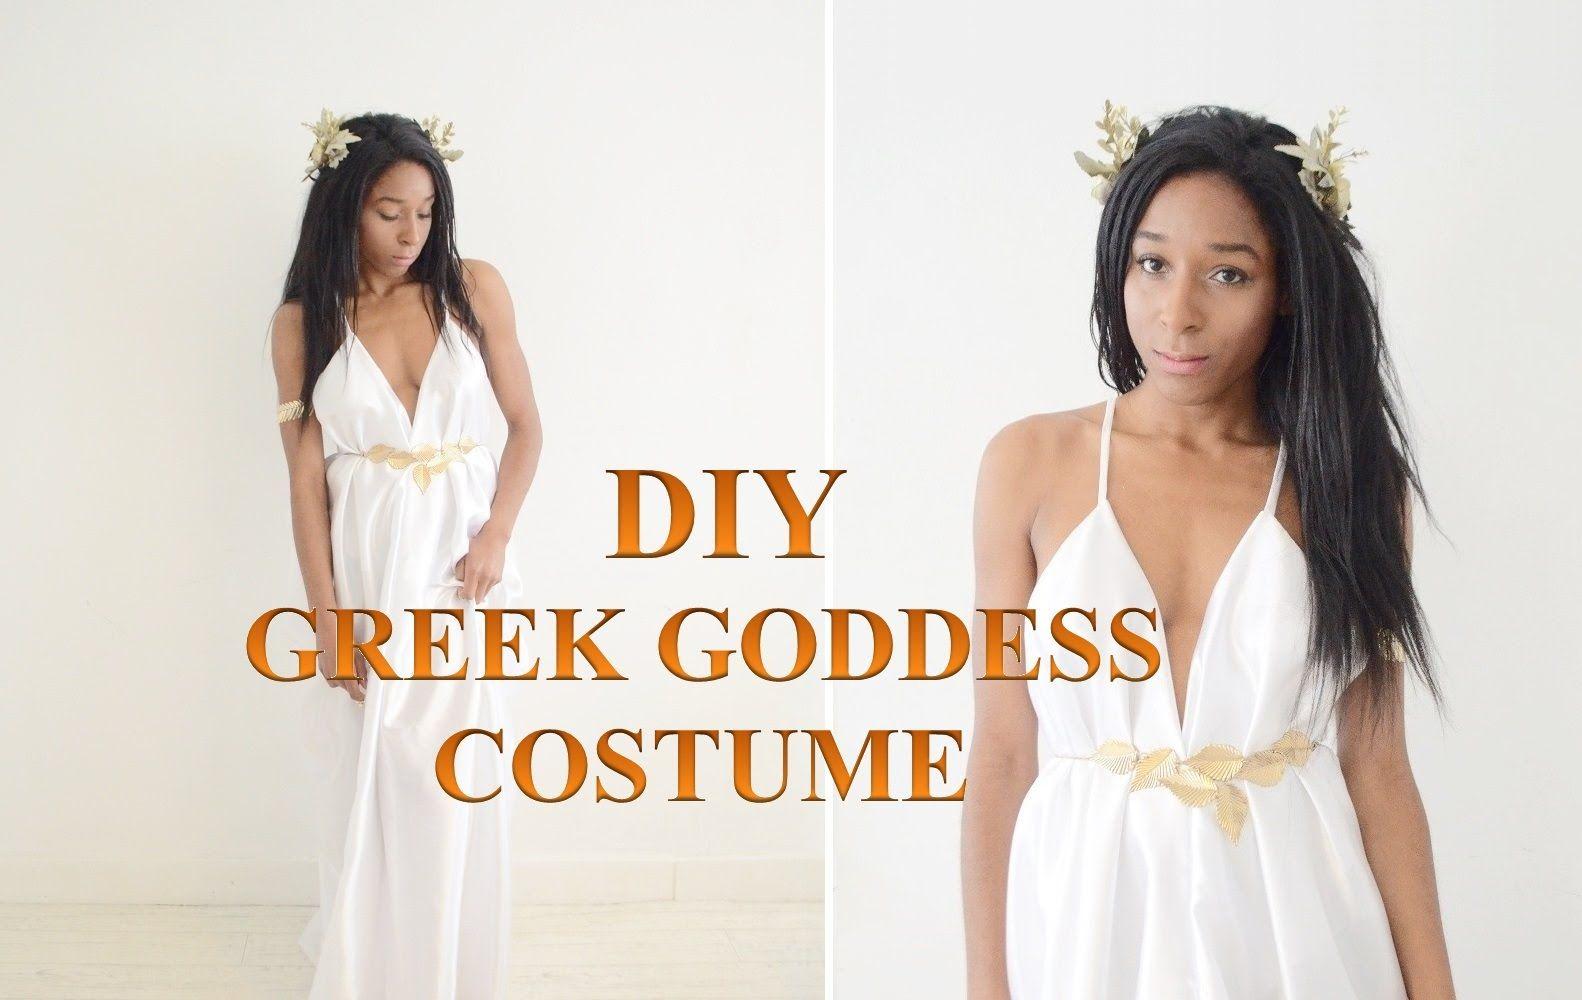 Diy Costume Greek Goddess Toga Dress Half Crown Toga Dress Toga Costume Diy Greek Goddess Costume Diy